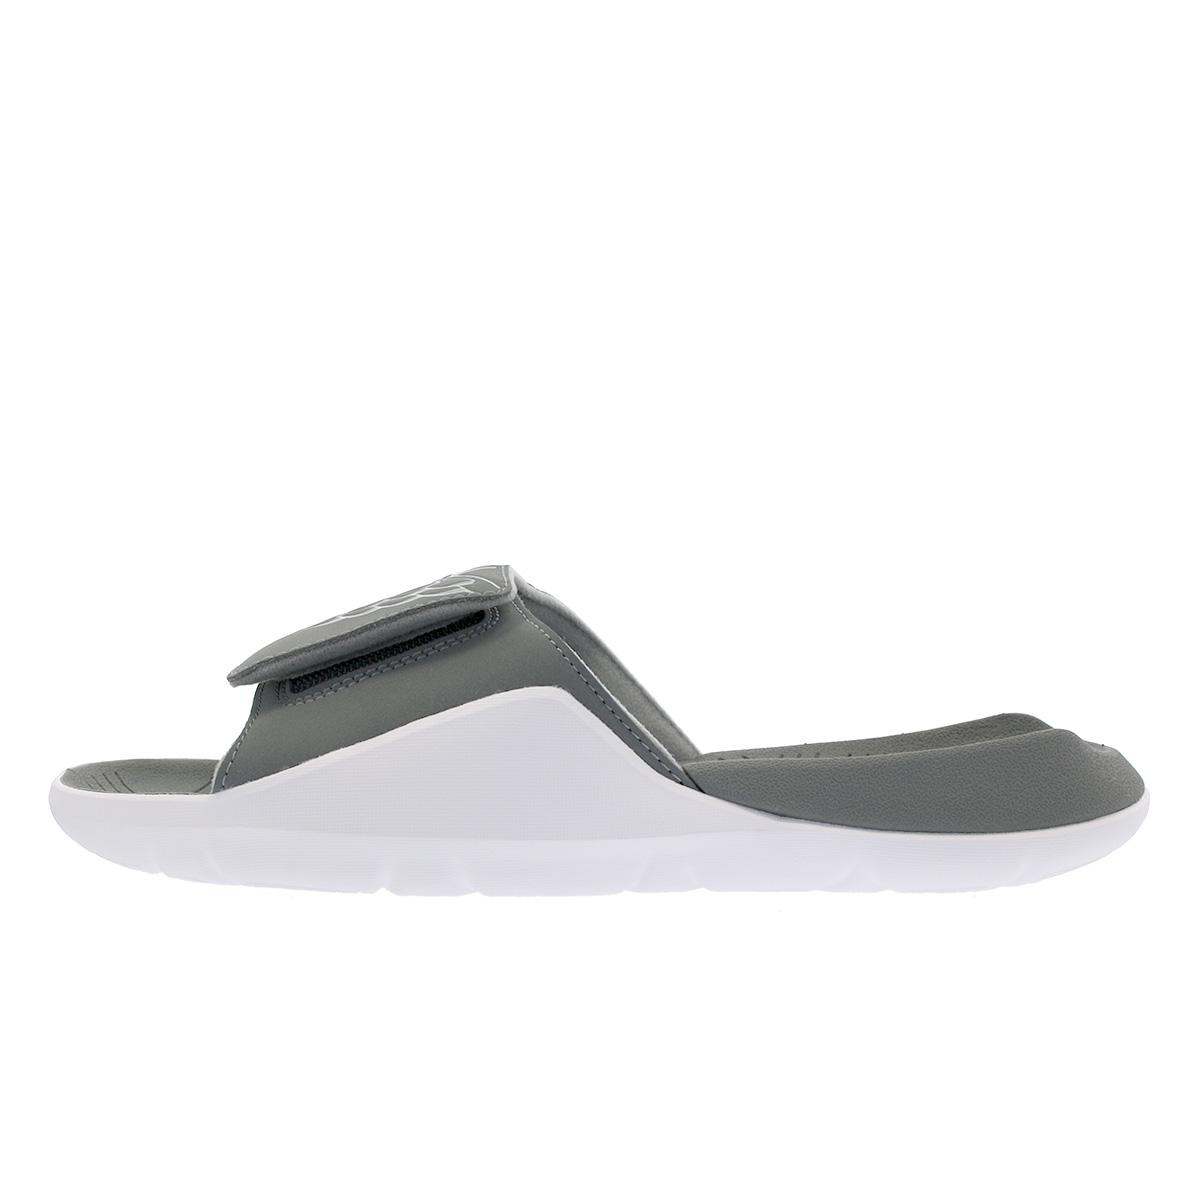 ea5cdef06baa NIKE JORDAN HYDRO 7 Nike Jordan high mud 7 SMOKE GREY PARTICLE GREY WHITE  aa2517-002